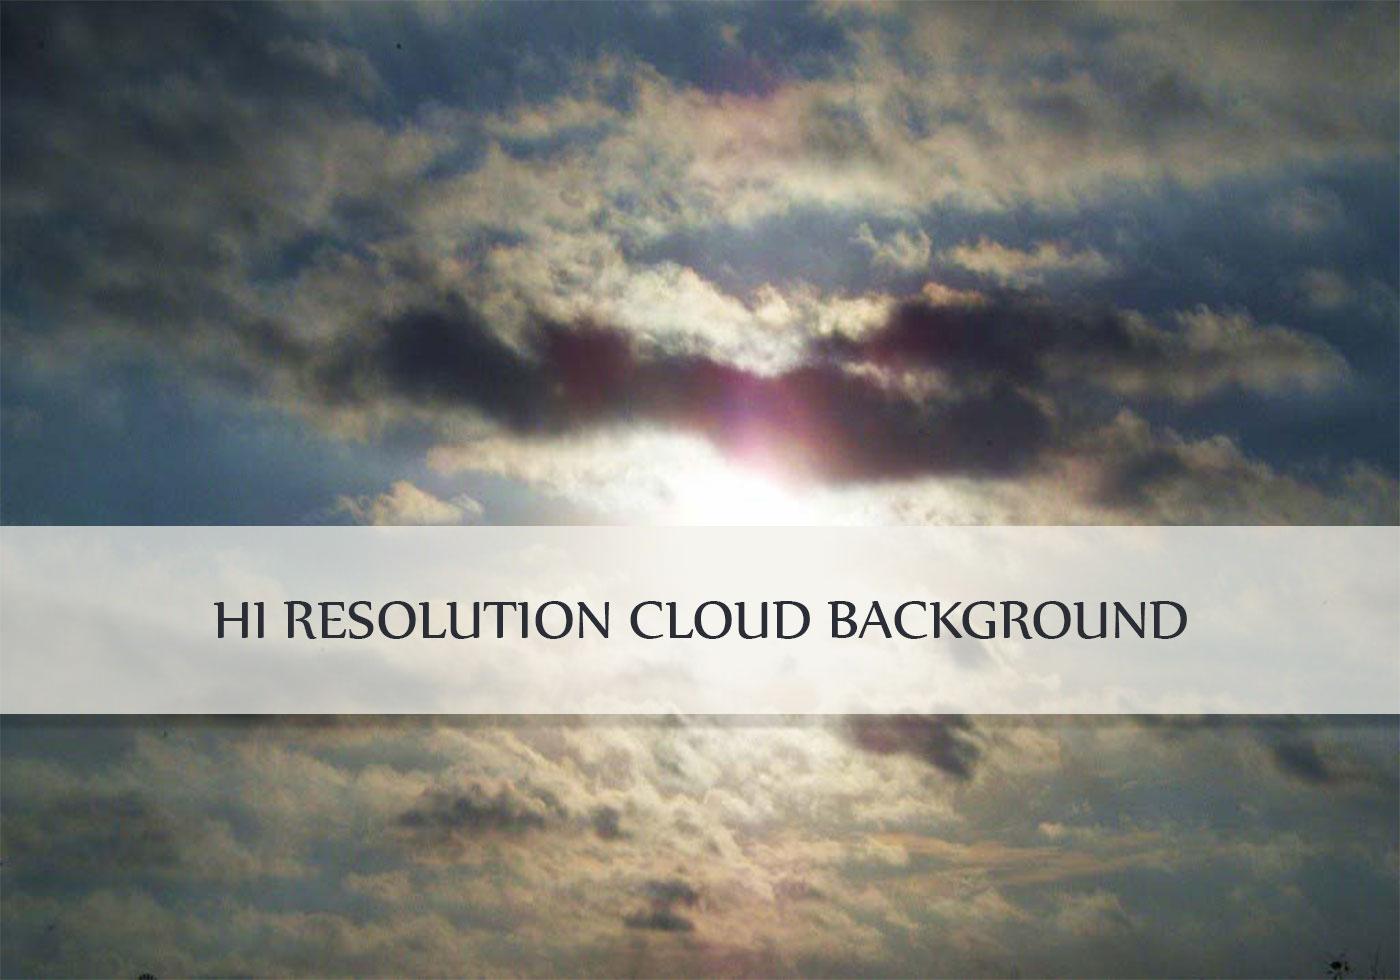 Cloud Background Free Photoshop Backgrounds At Brusheezy